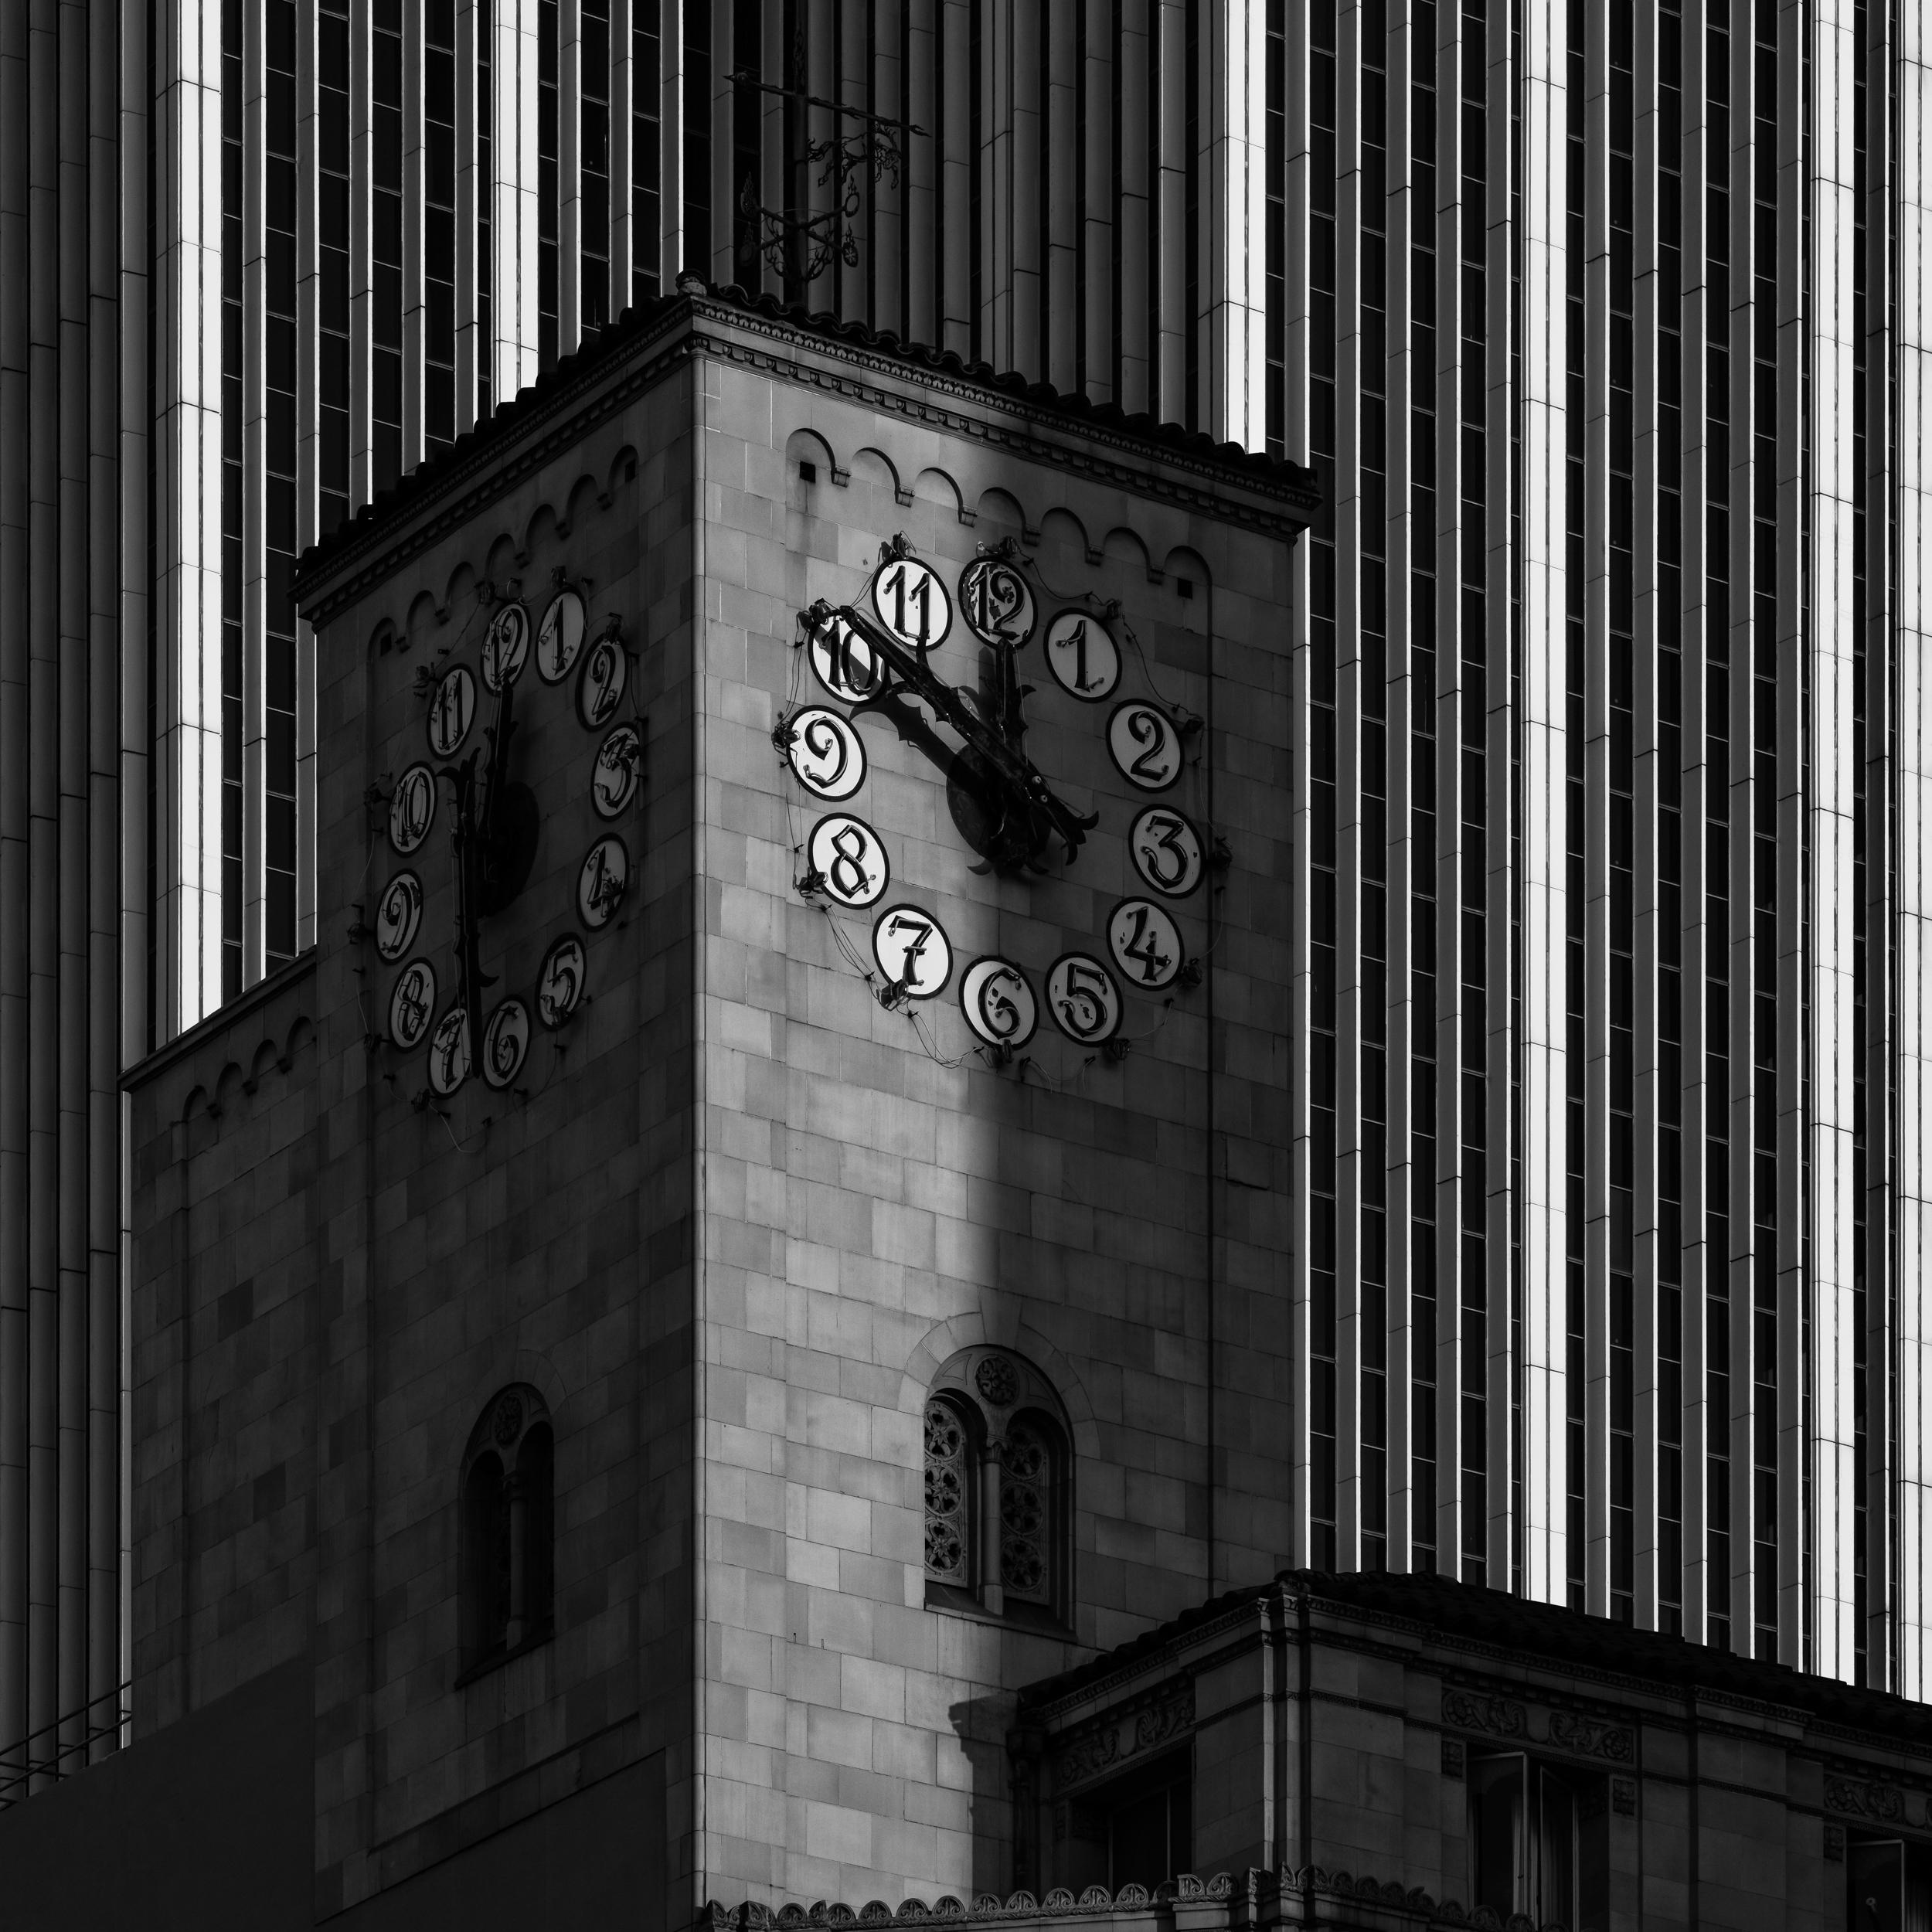 JAMES OVIATT BUILDING_TOWER_002.jpg